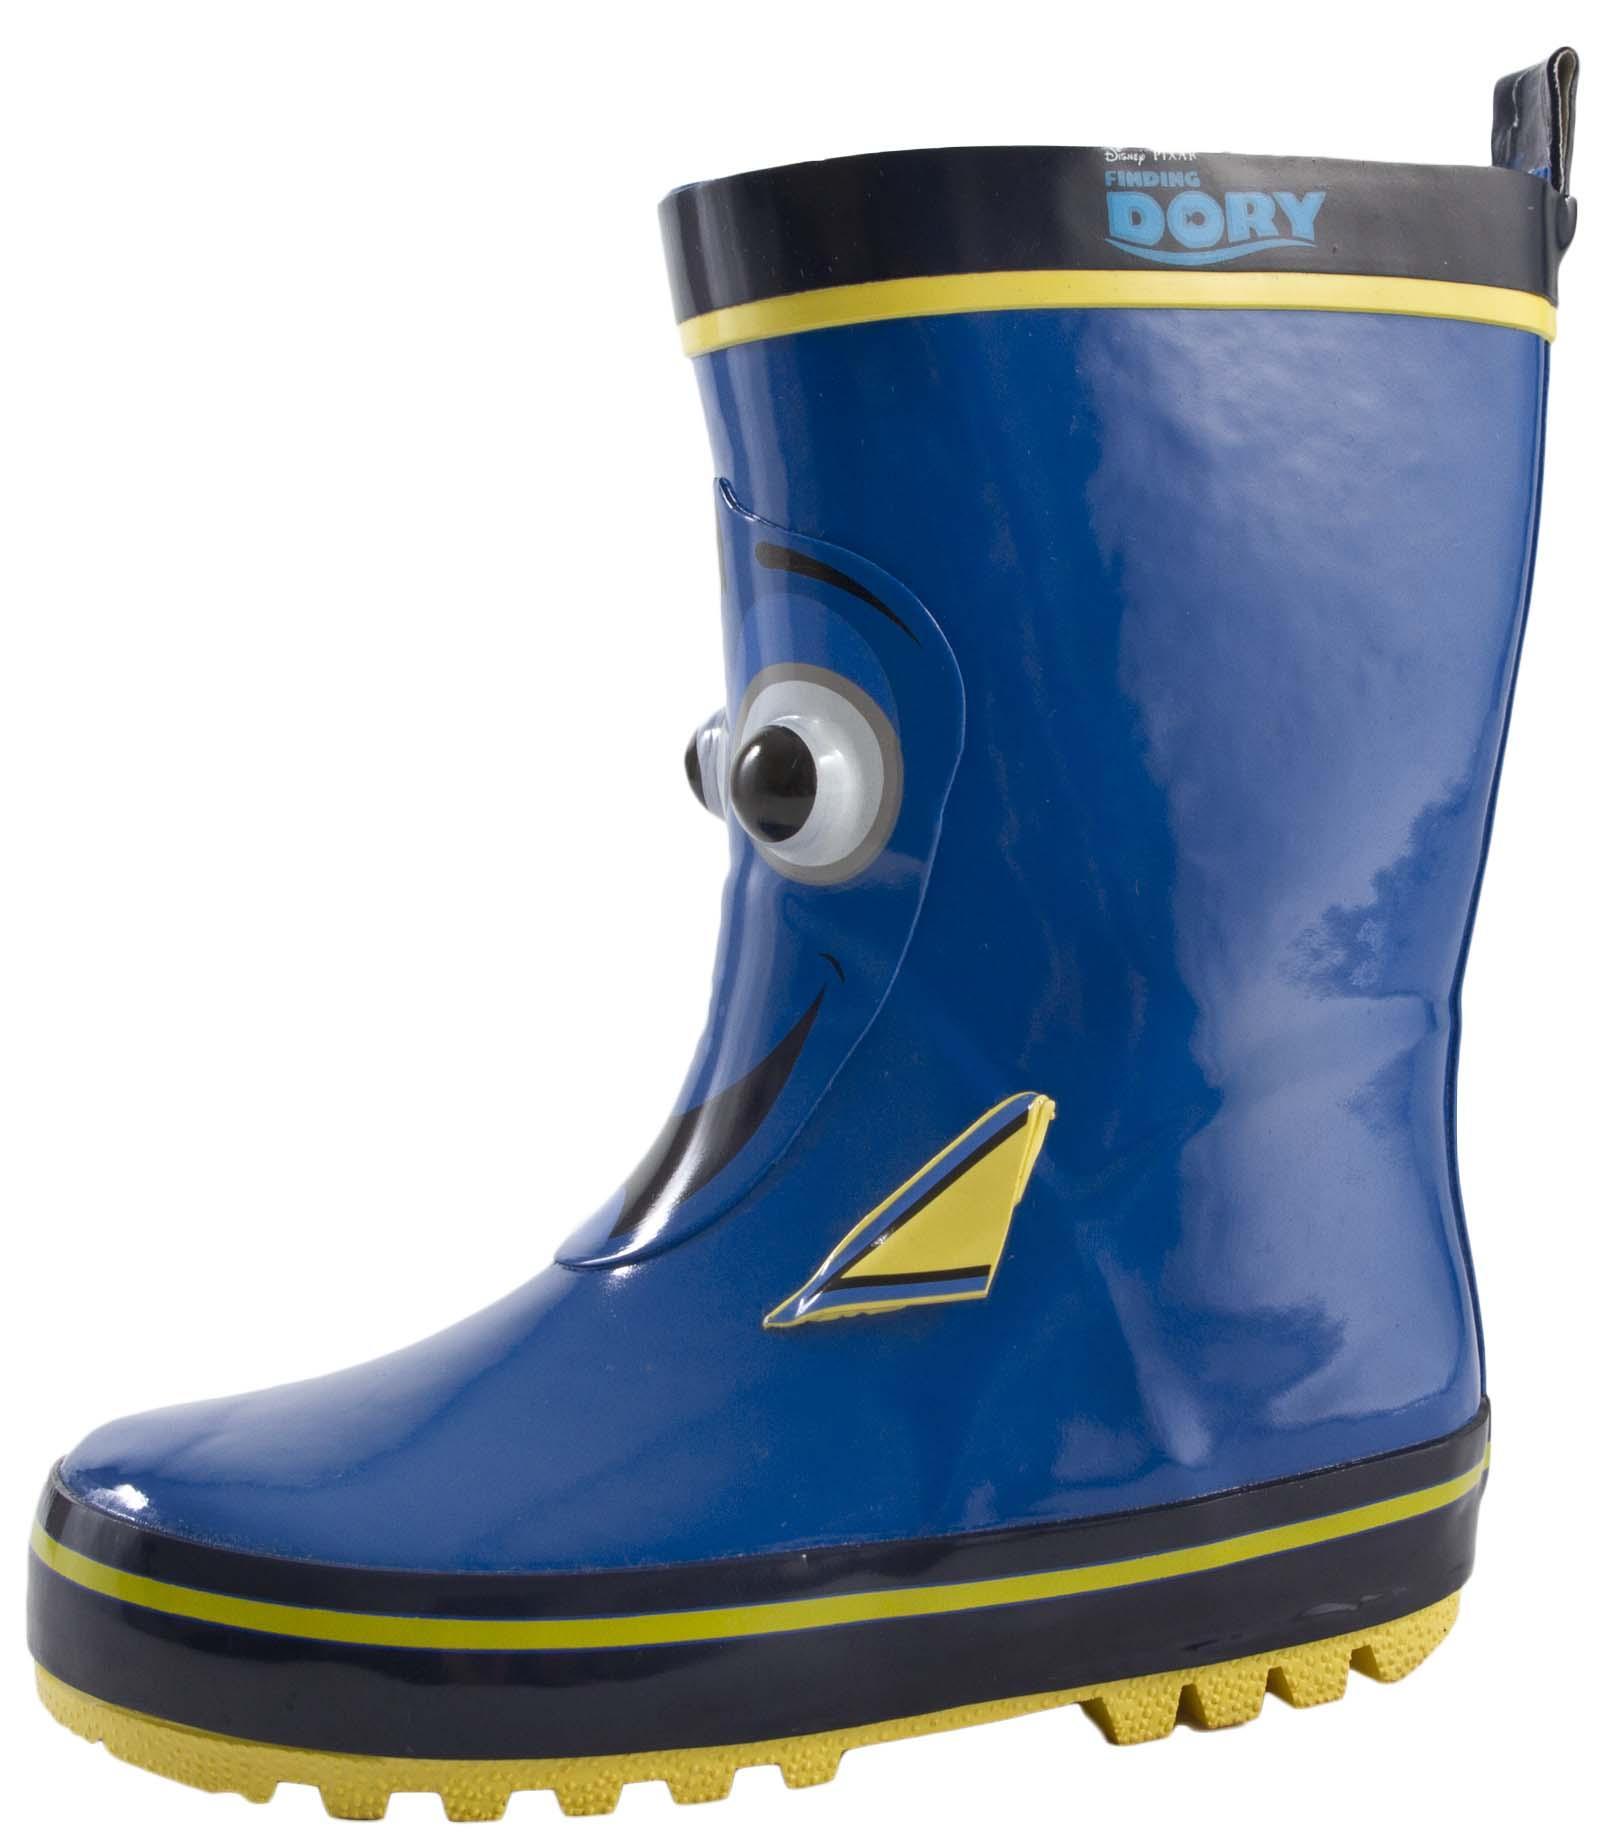 b23ff317e8bb Disney Finding Dory 3D Rubber Wellington Boots Rain Wellies Boys Girls Kids  Size